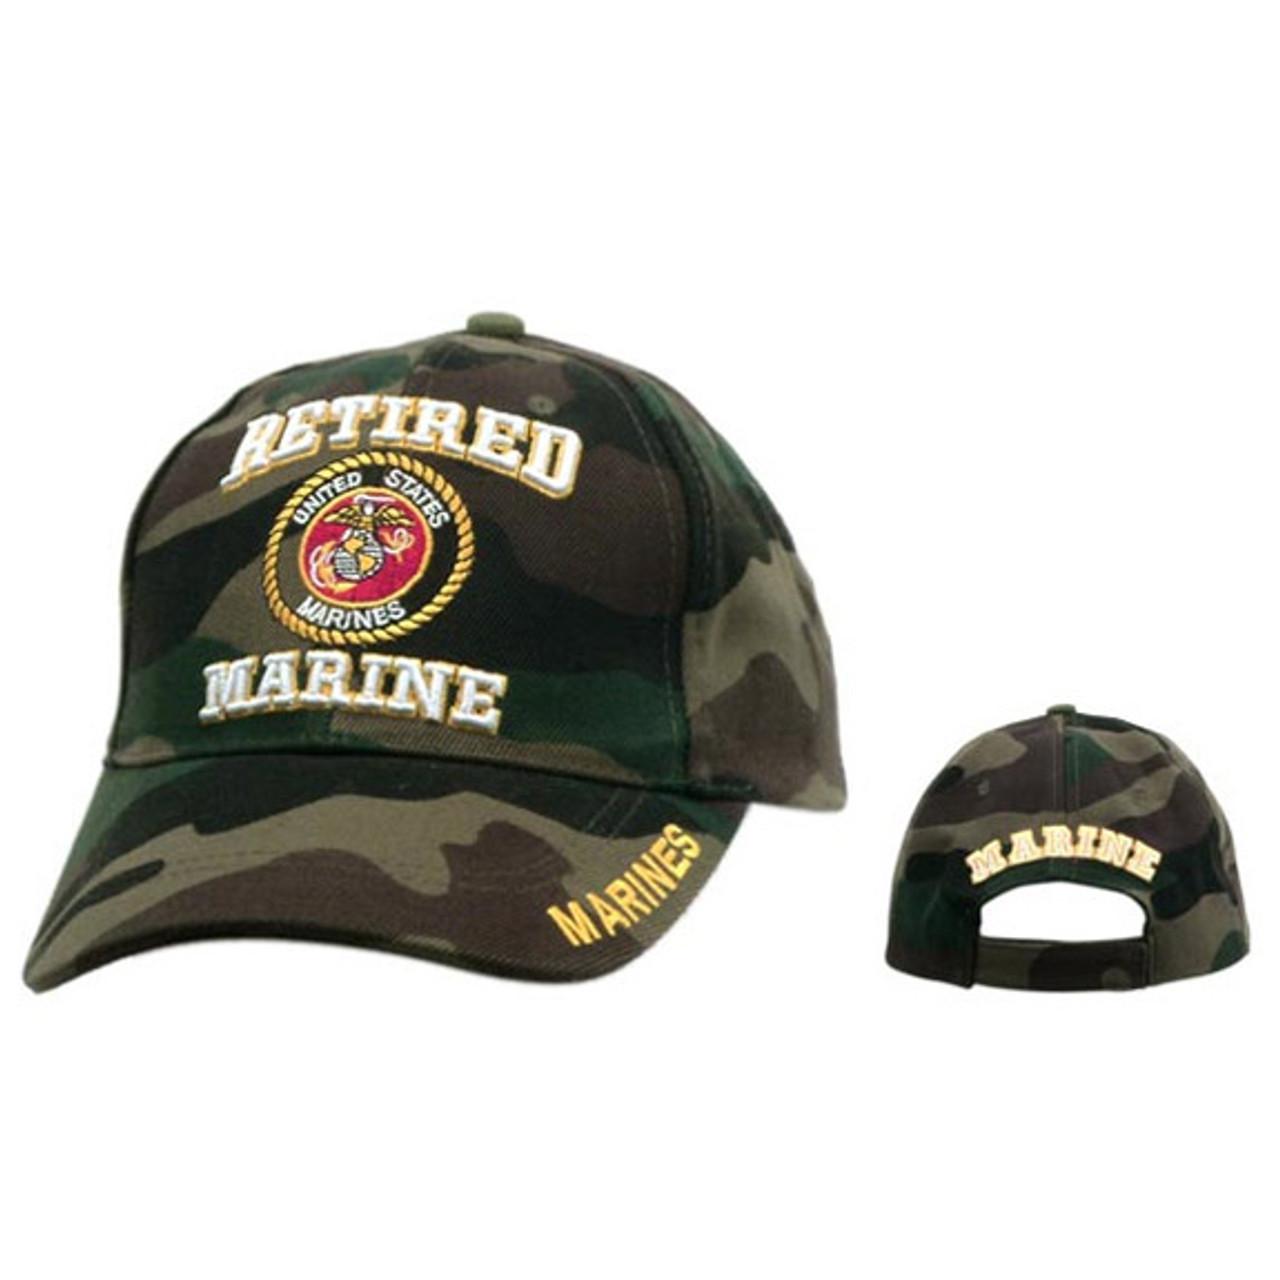 Wholesale Baseball Cap C131 (1 pc.) Retired Marine Camo